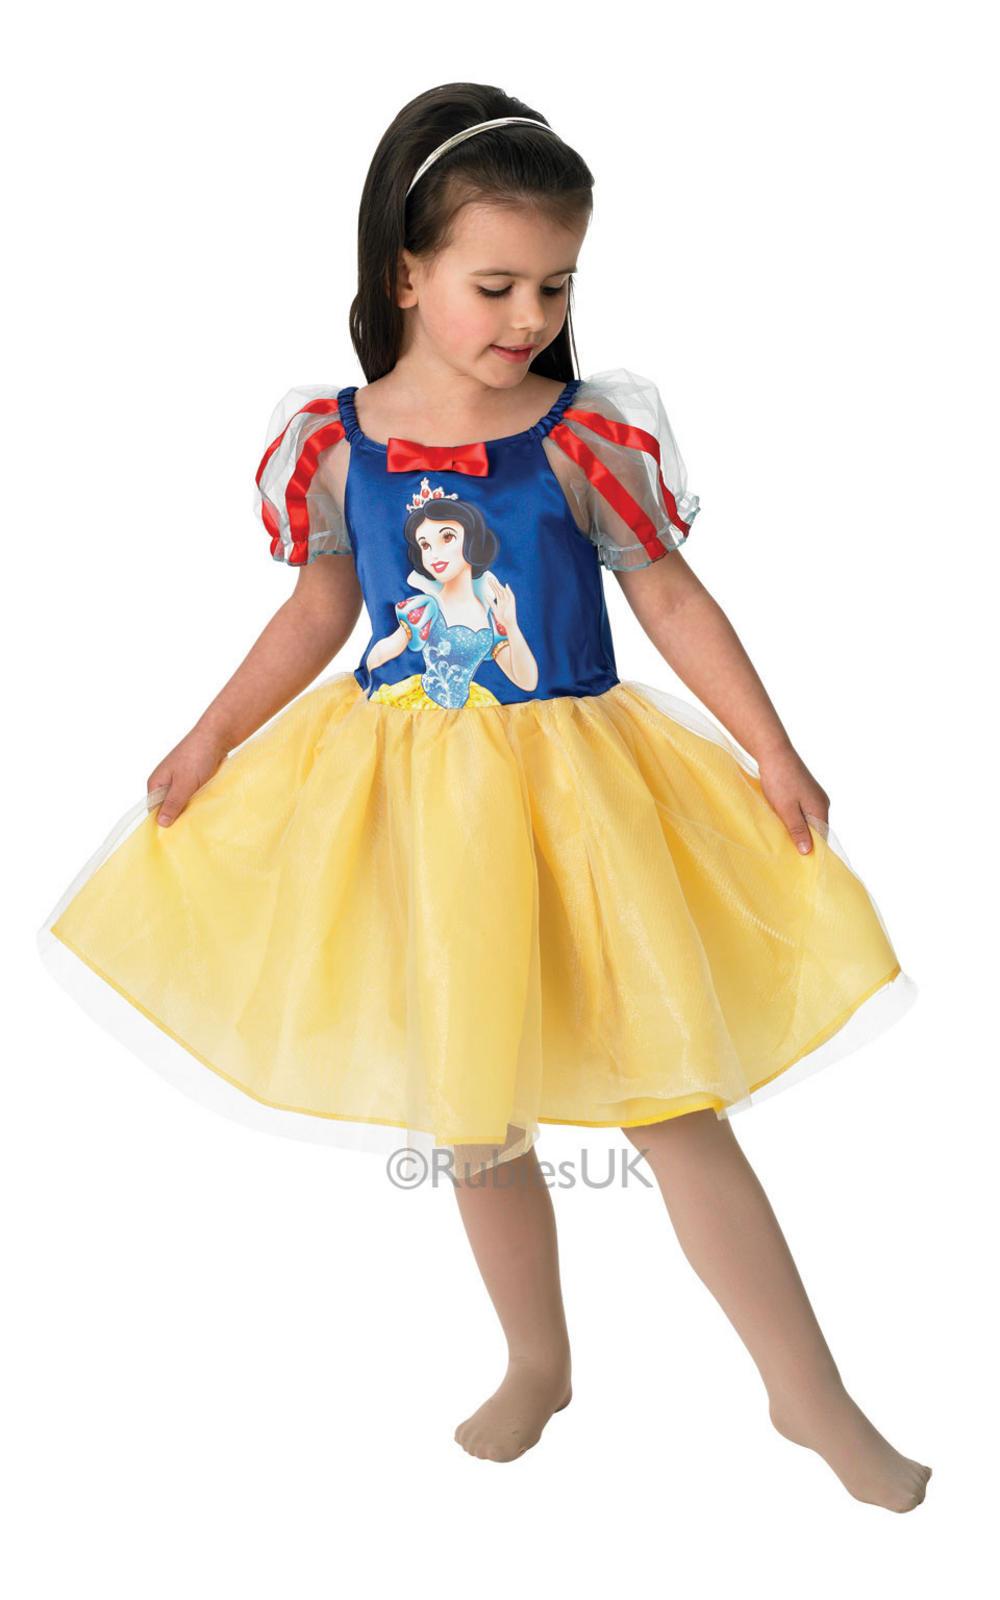 152779c57 Snow White Ballerina Costume